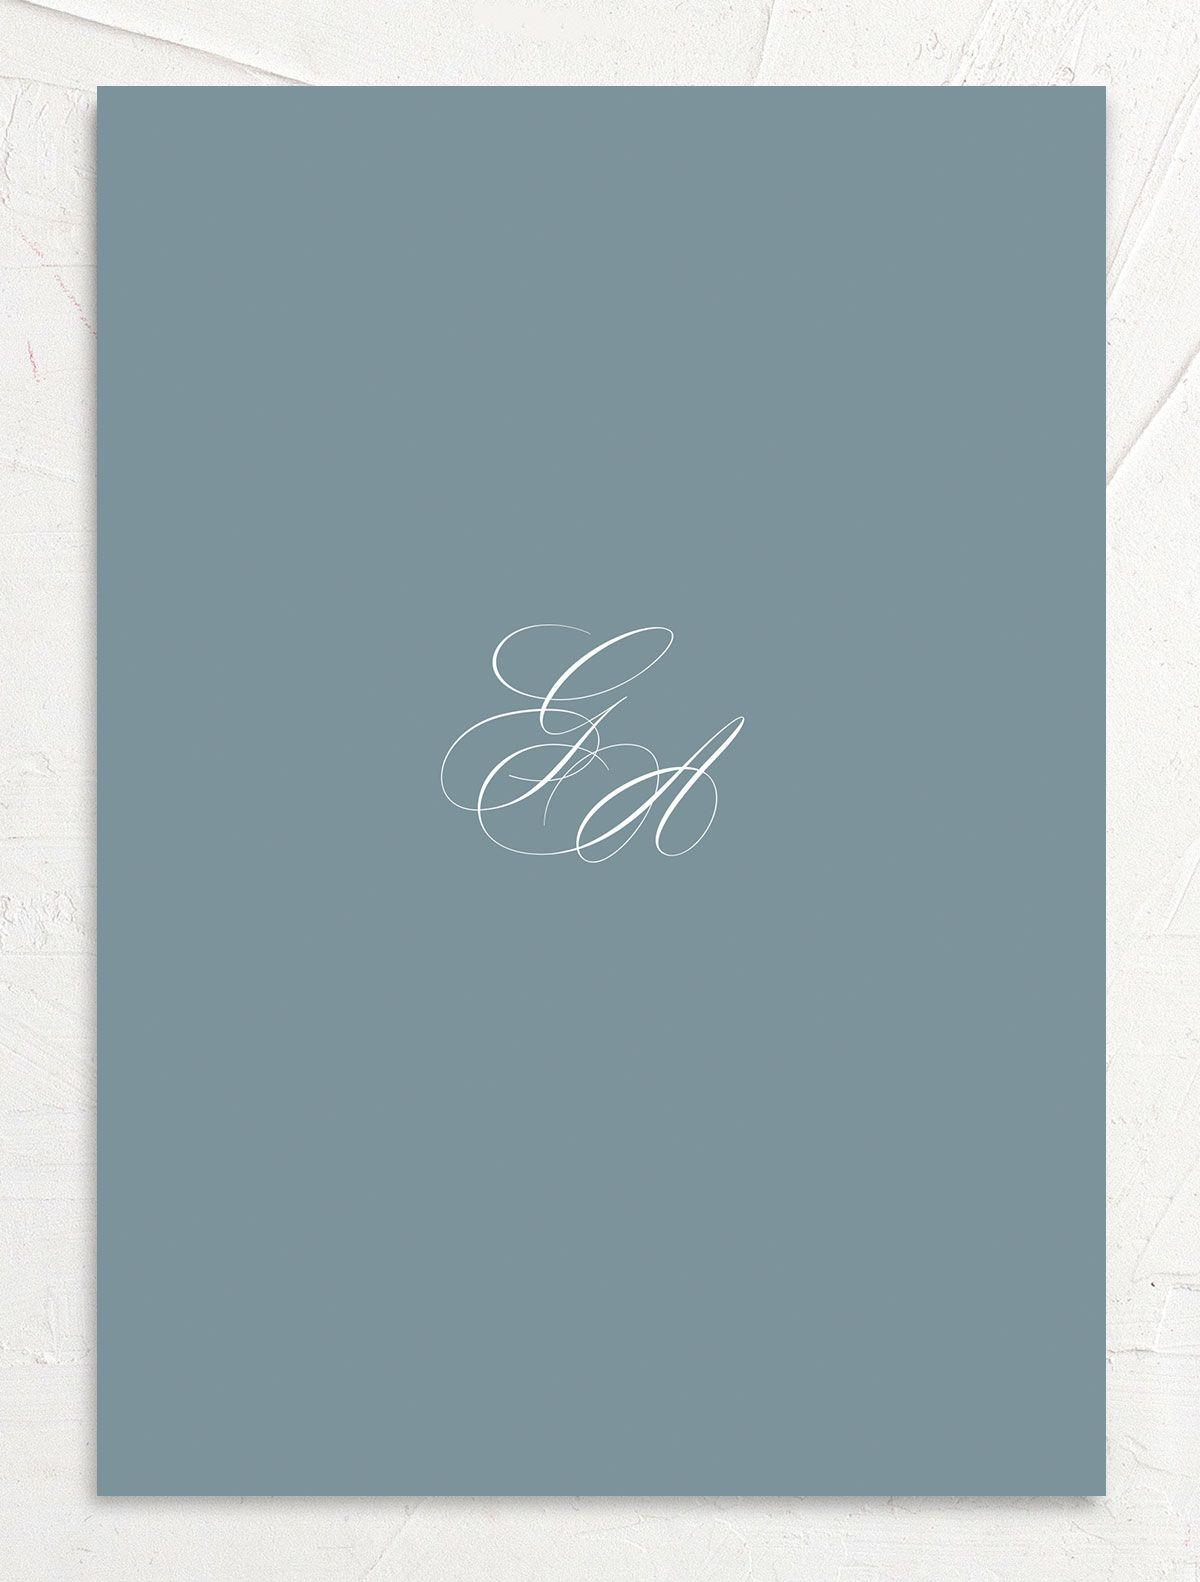 Elegant Photograph wedding invitation back in white